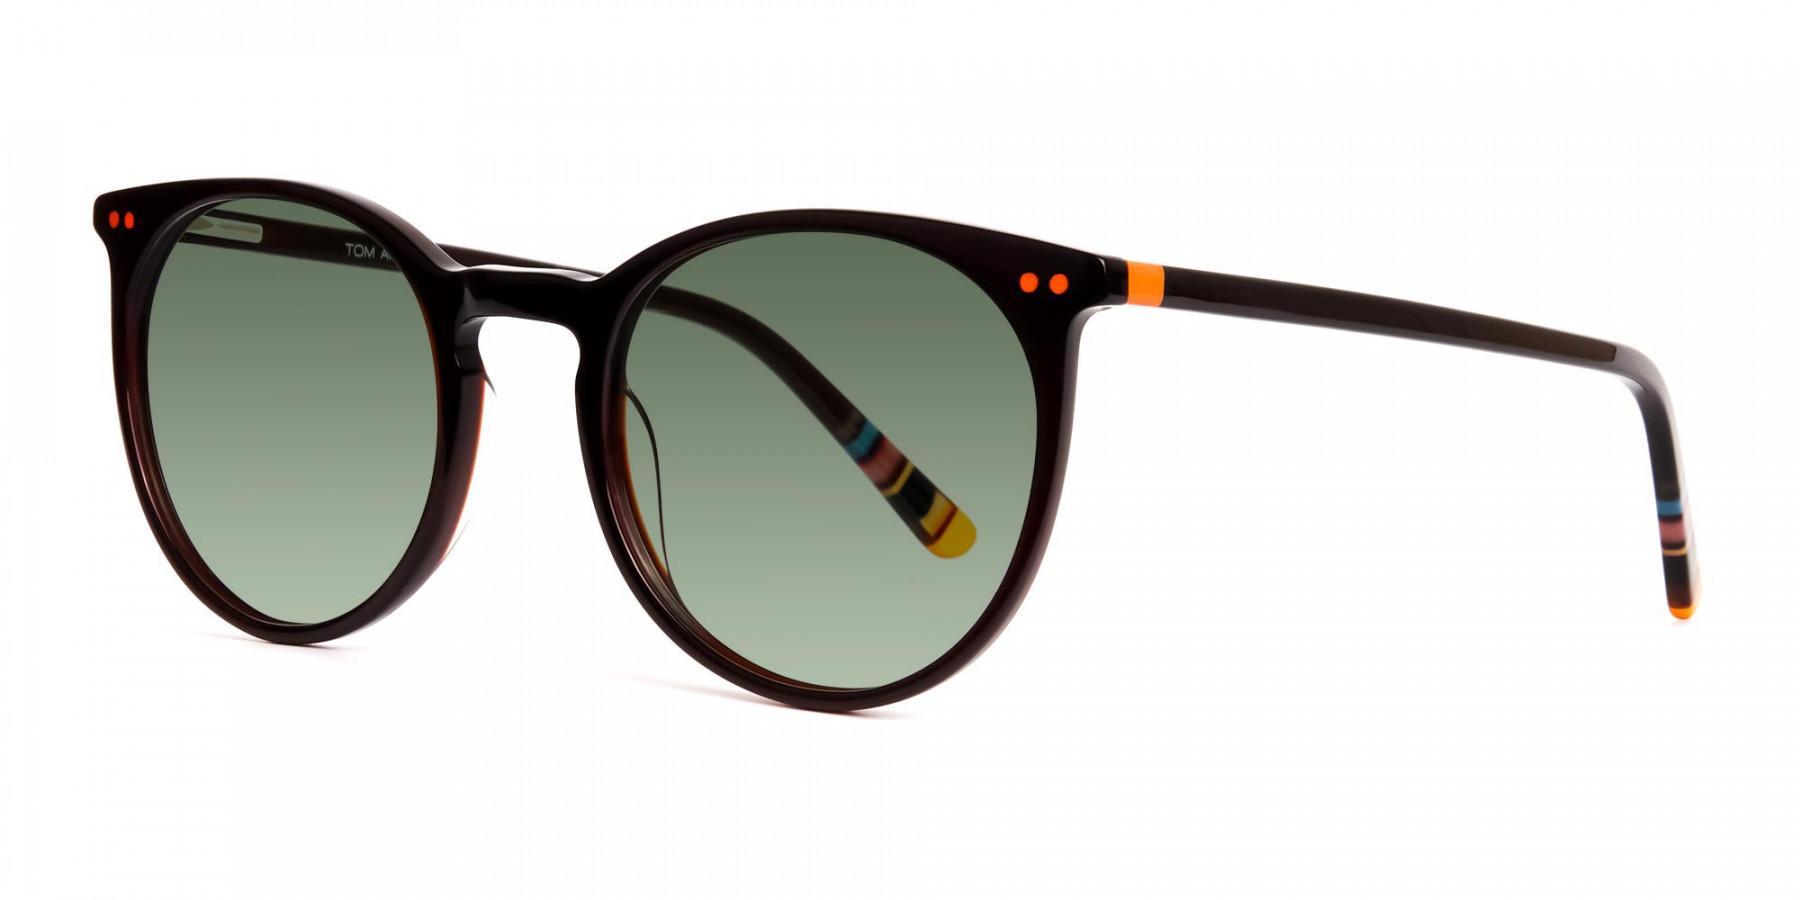 dark-brown-round-green-tinted-sunglasses-frames-3